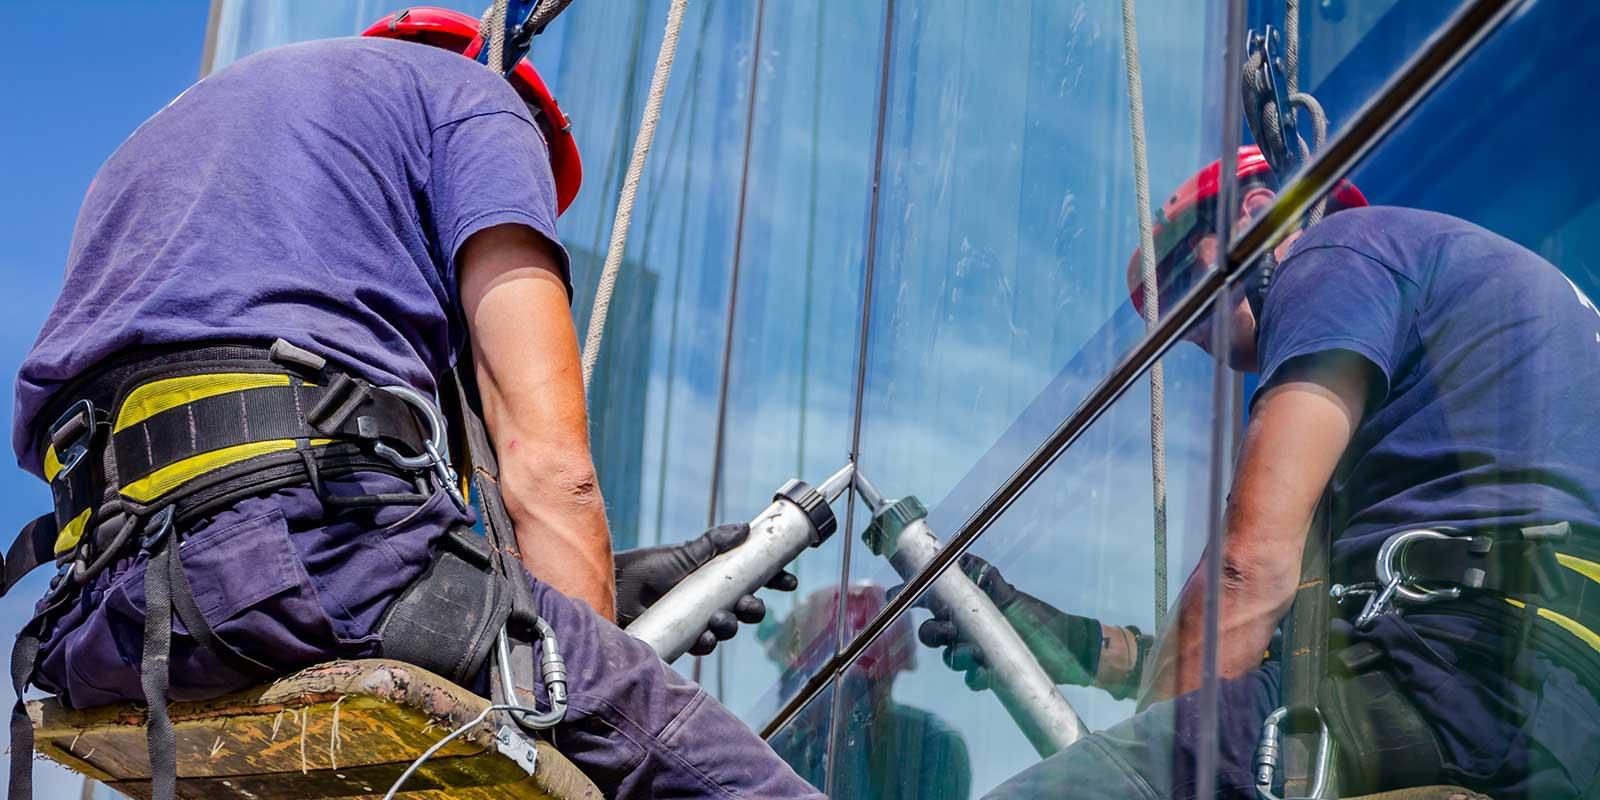 Caulking specialist applying caulking to window frame